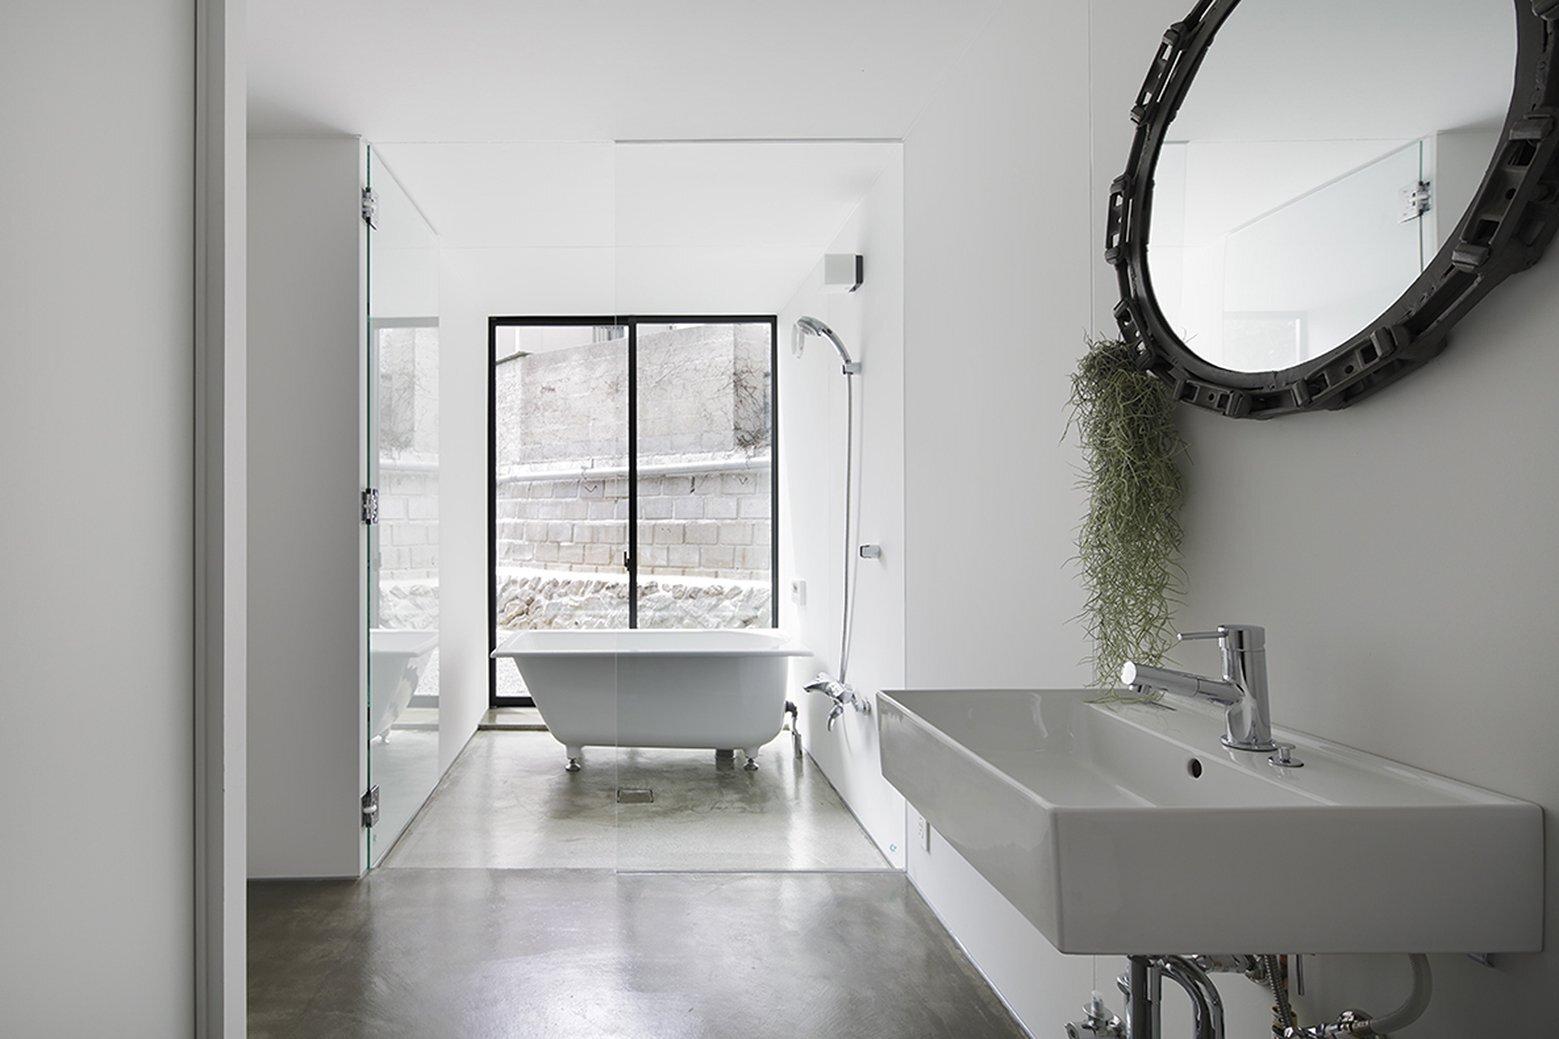 House in Miyake - Japanese House - Hidetaka Nakahara Architects - Yoshio Ohno Architects - Hiroshima Japan - Bathroom - Humble Homes